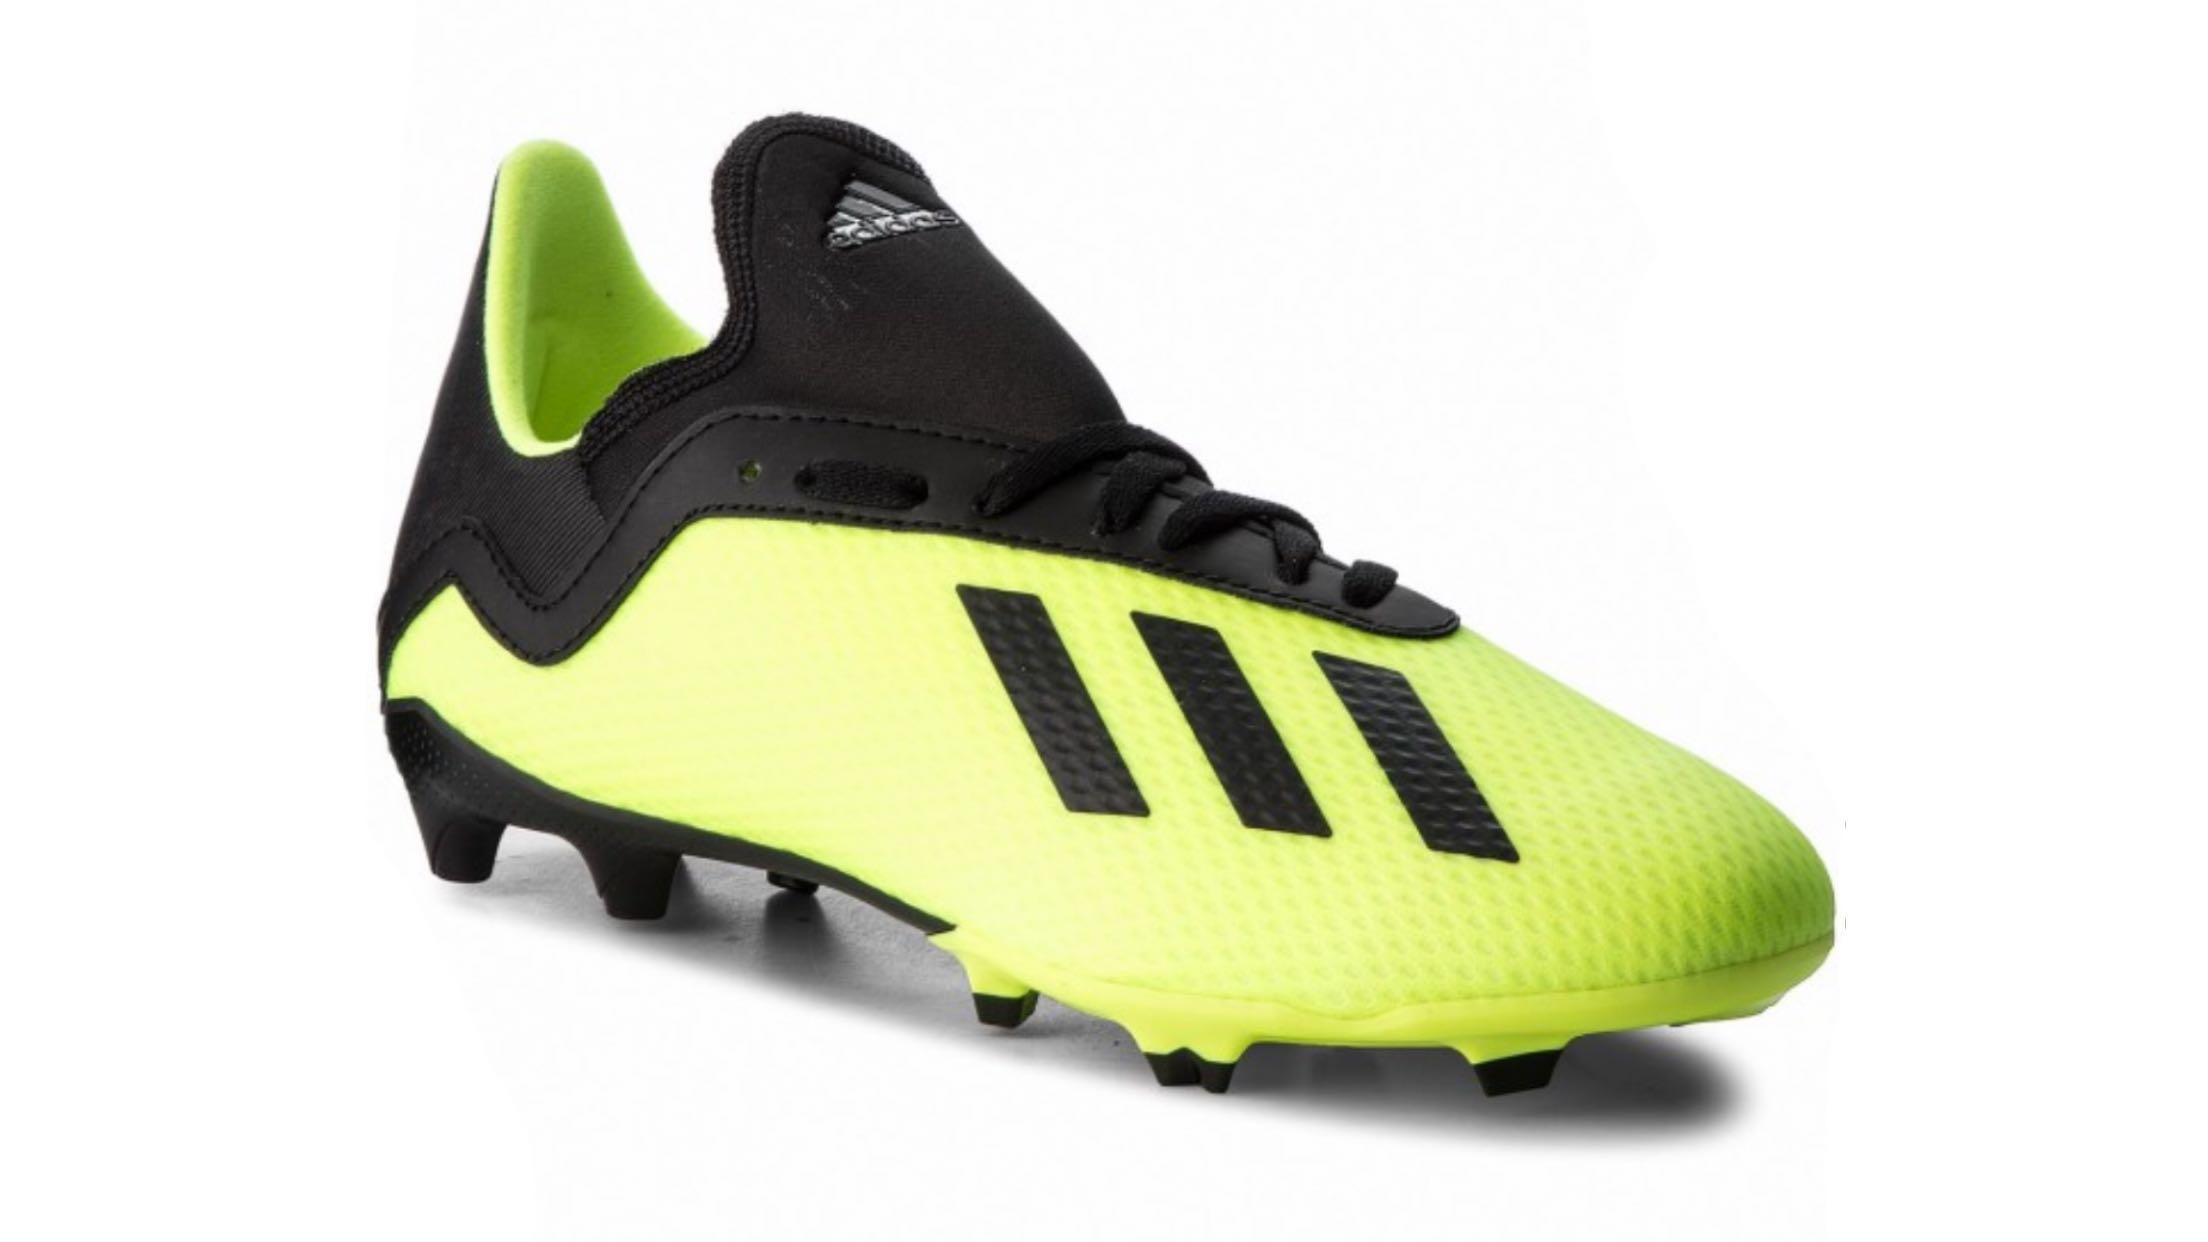 Adidas Soccer Boots/Cleats, Adidas X 18